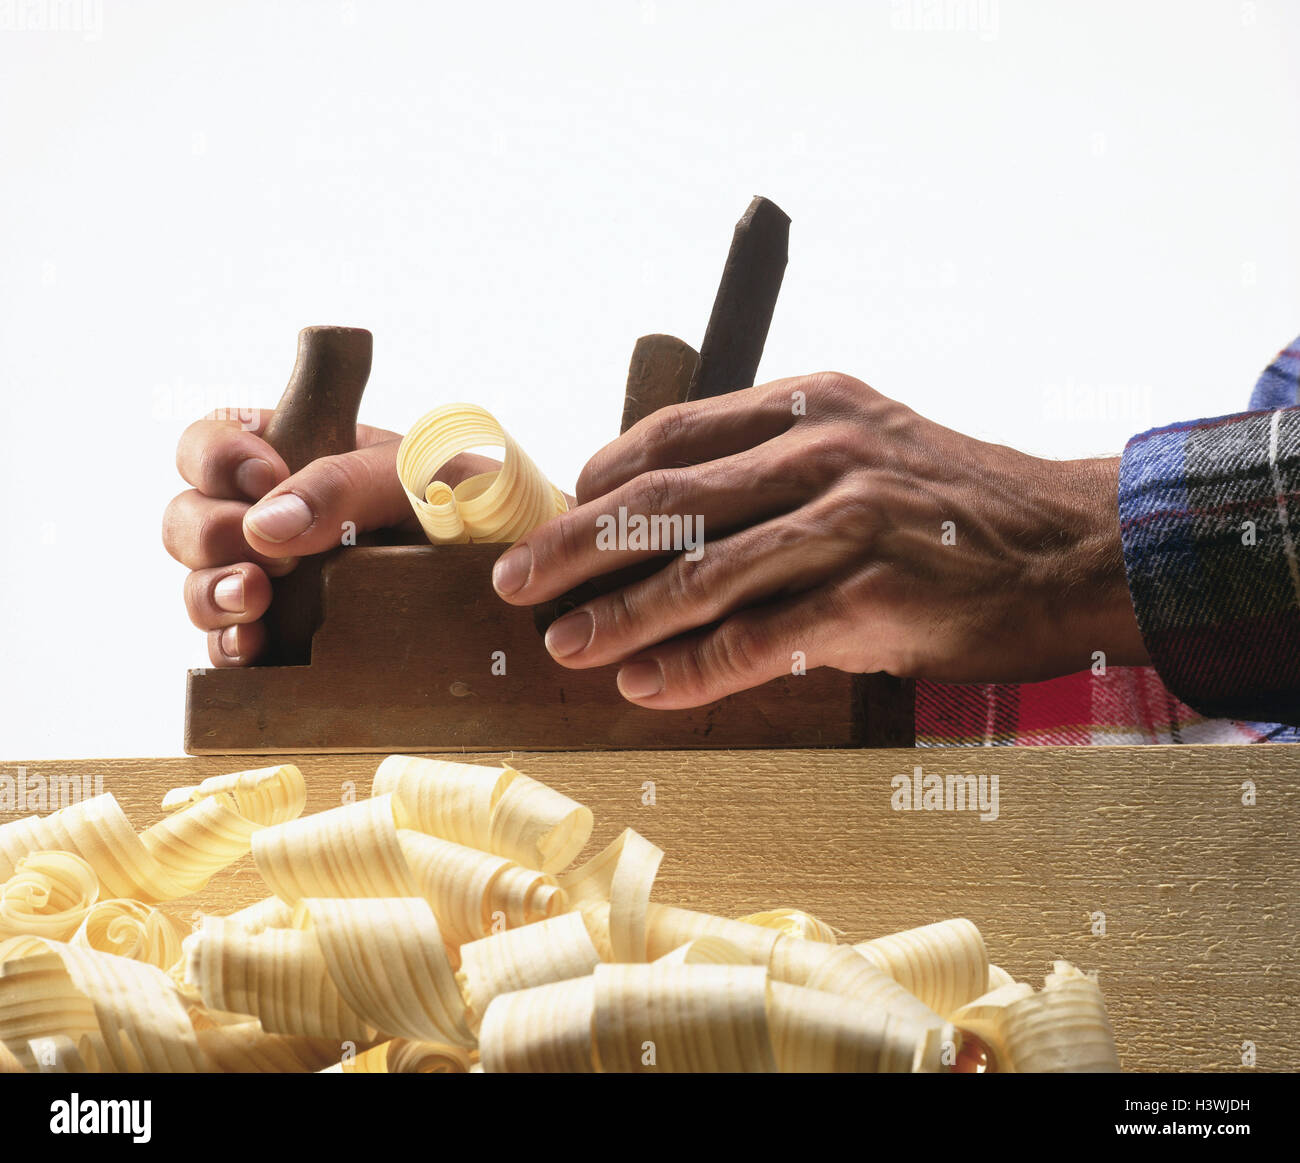 Carpenters, work, chop detail, hands, planes man, wood processing, shavings, wood shavings, occupation, work, work, - Stock Image